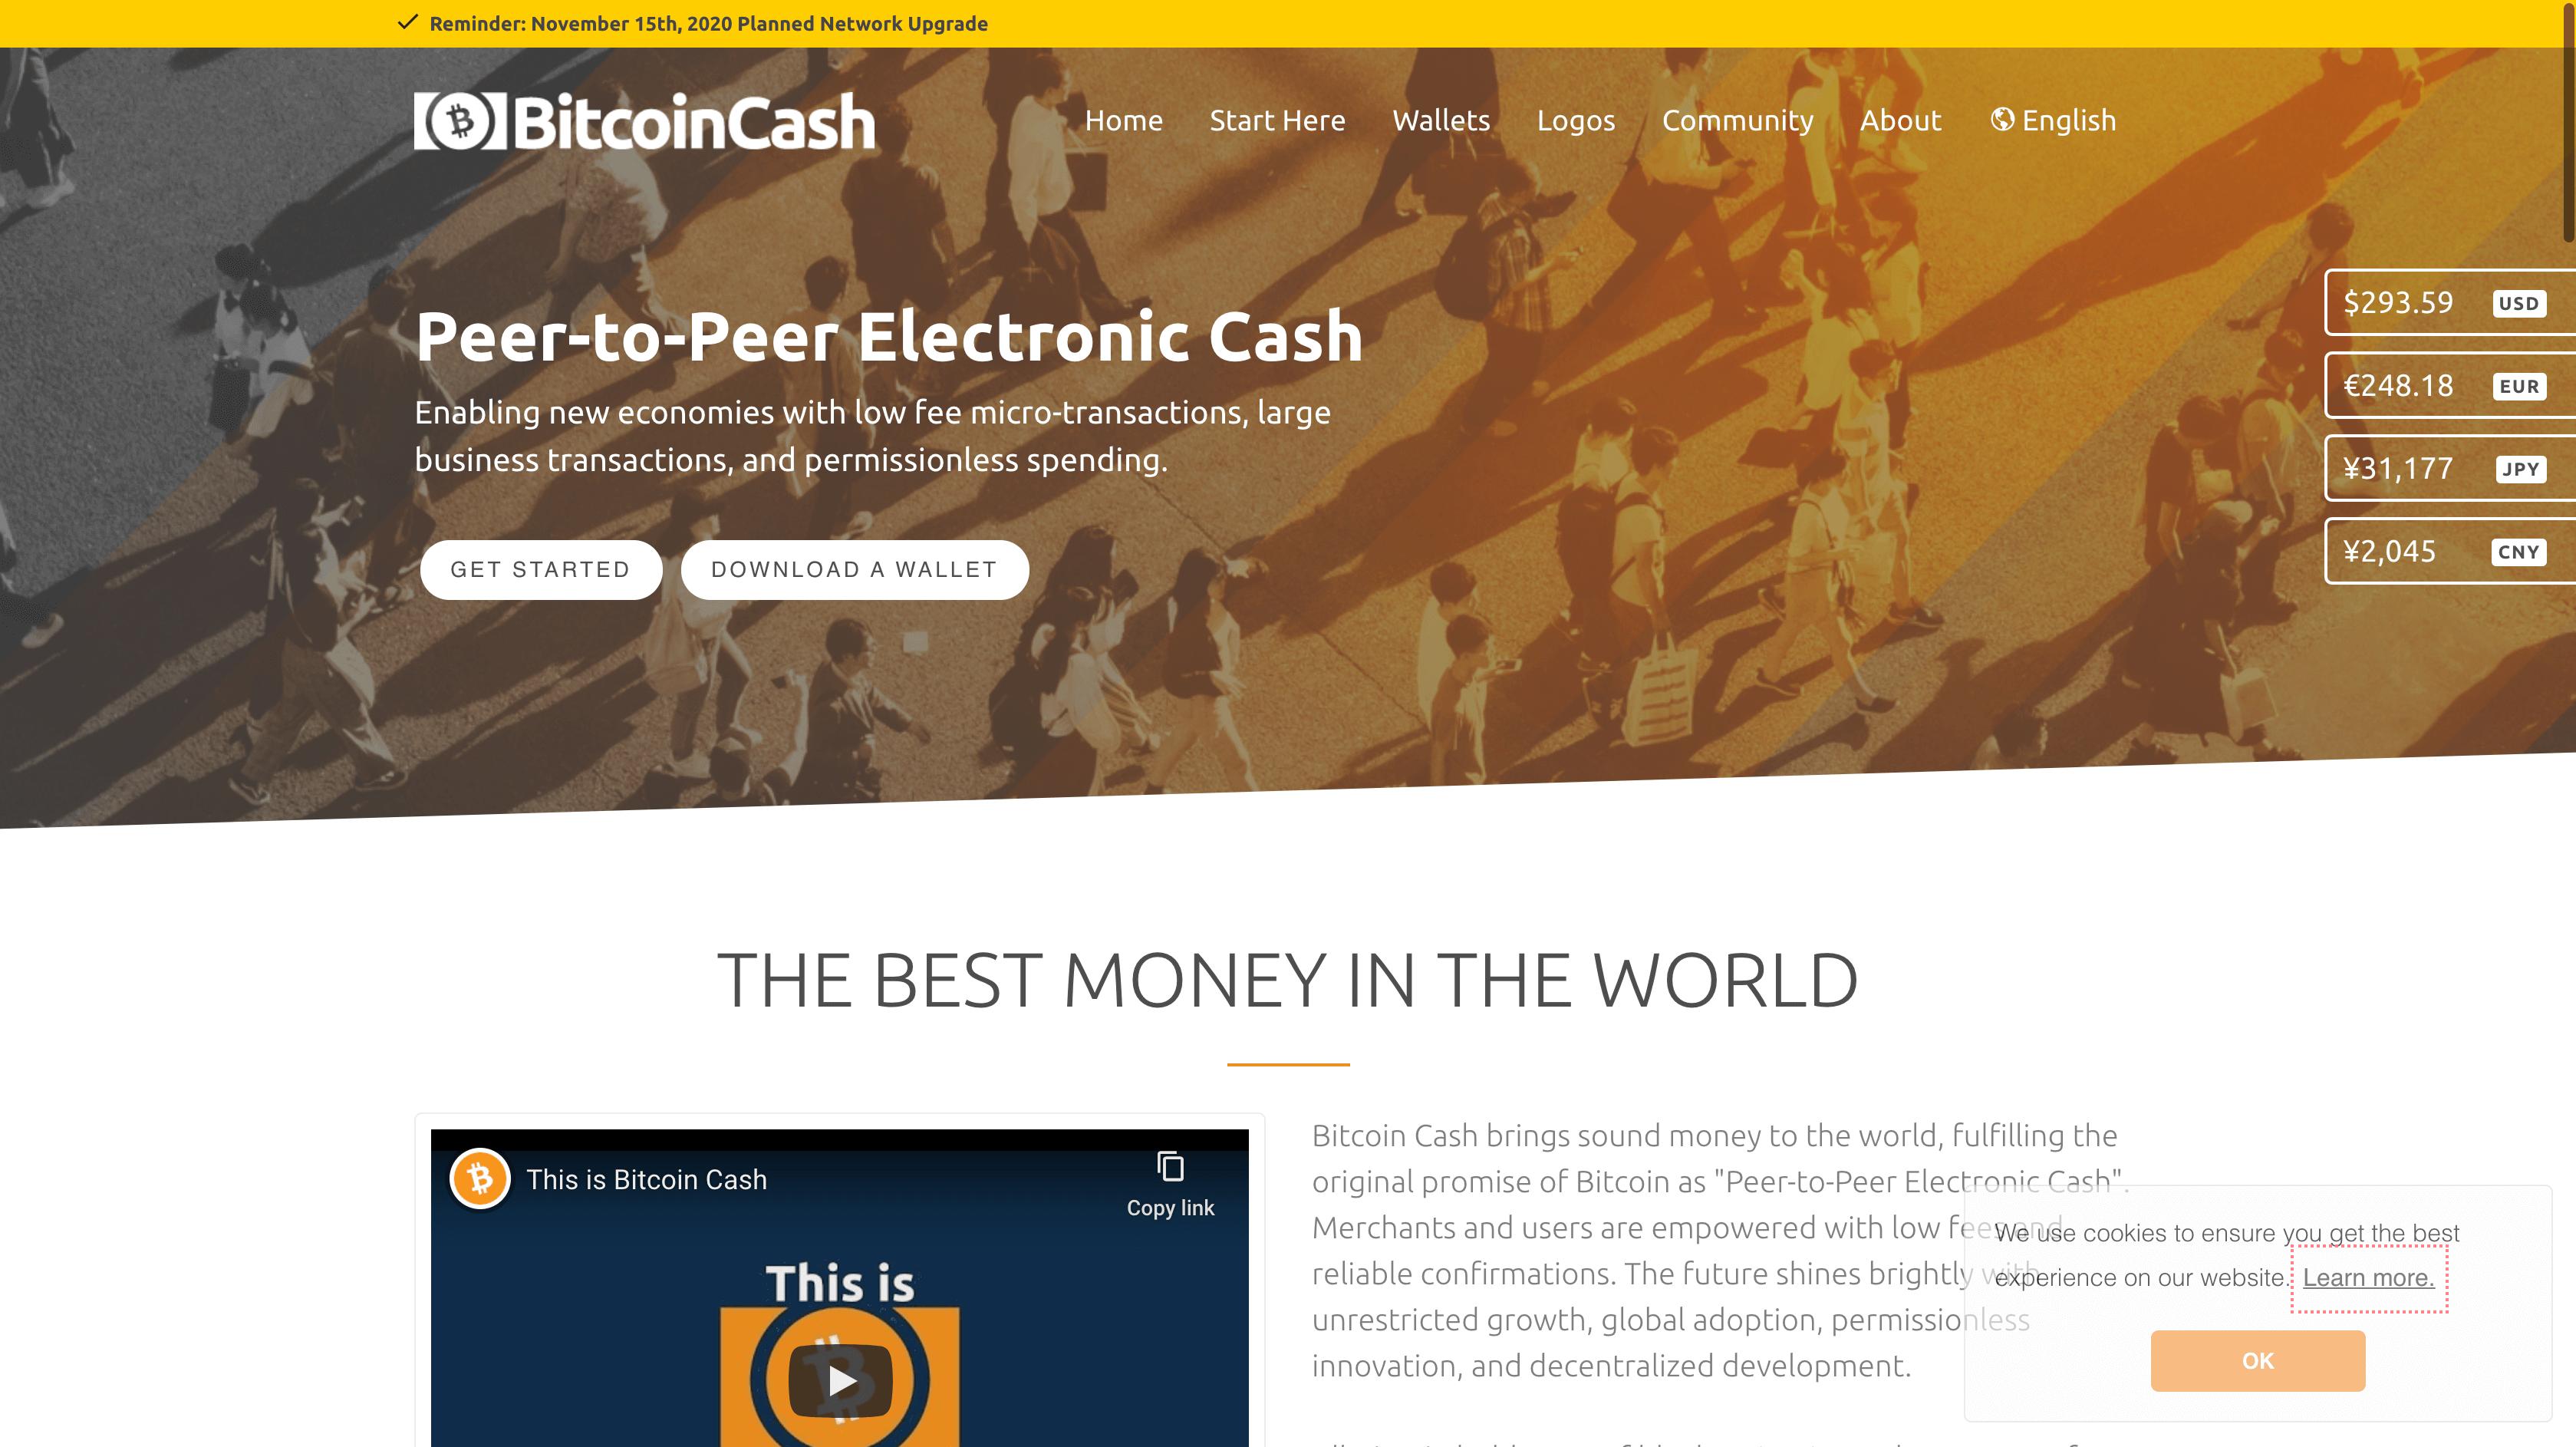 Bitcoin Cash or not